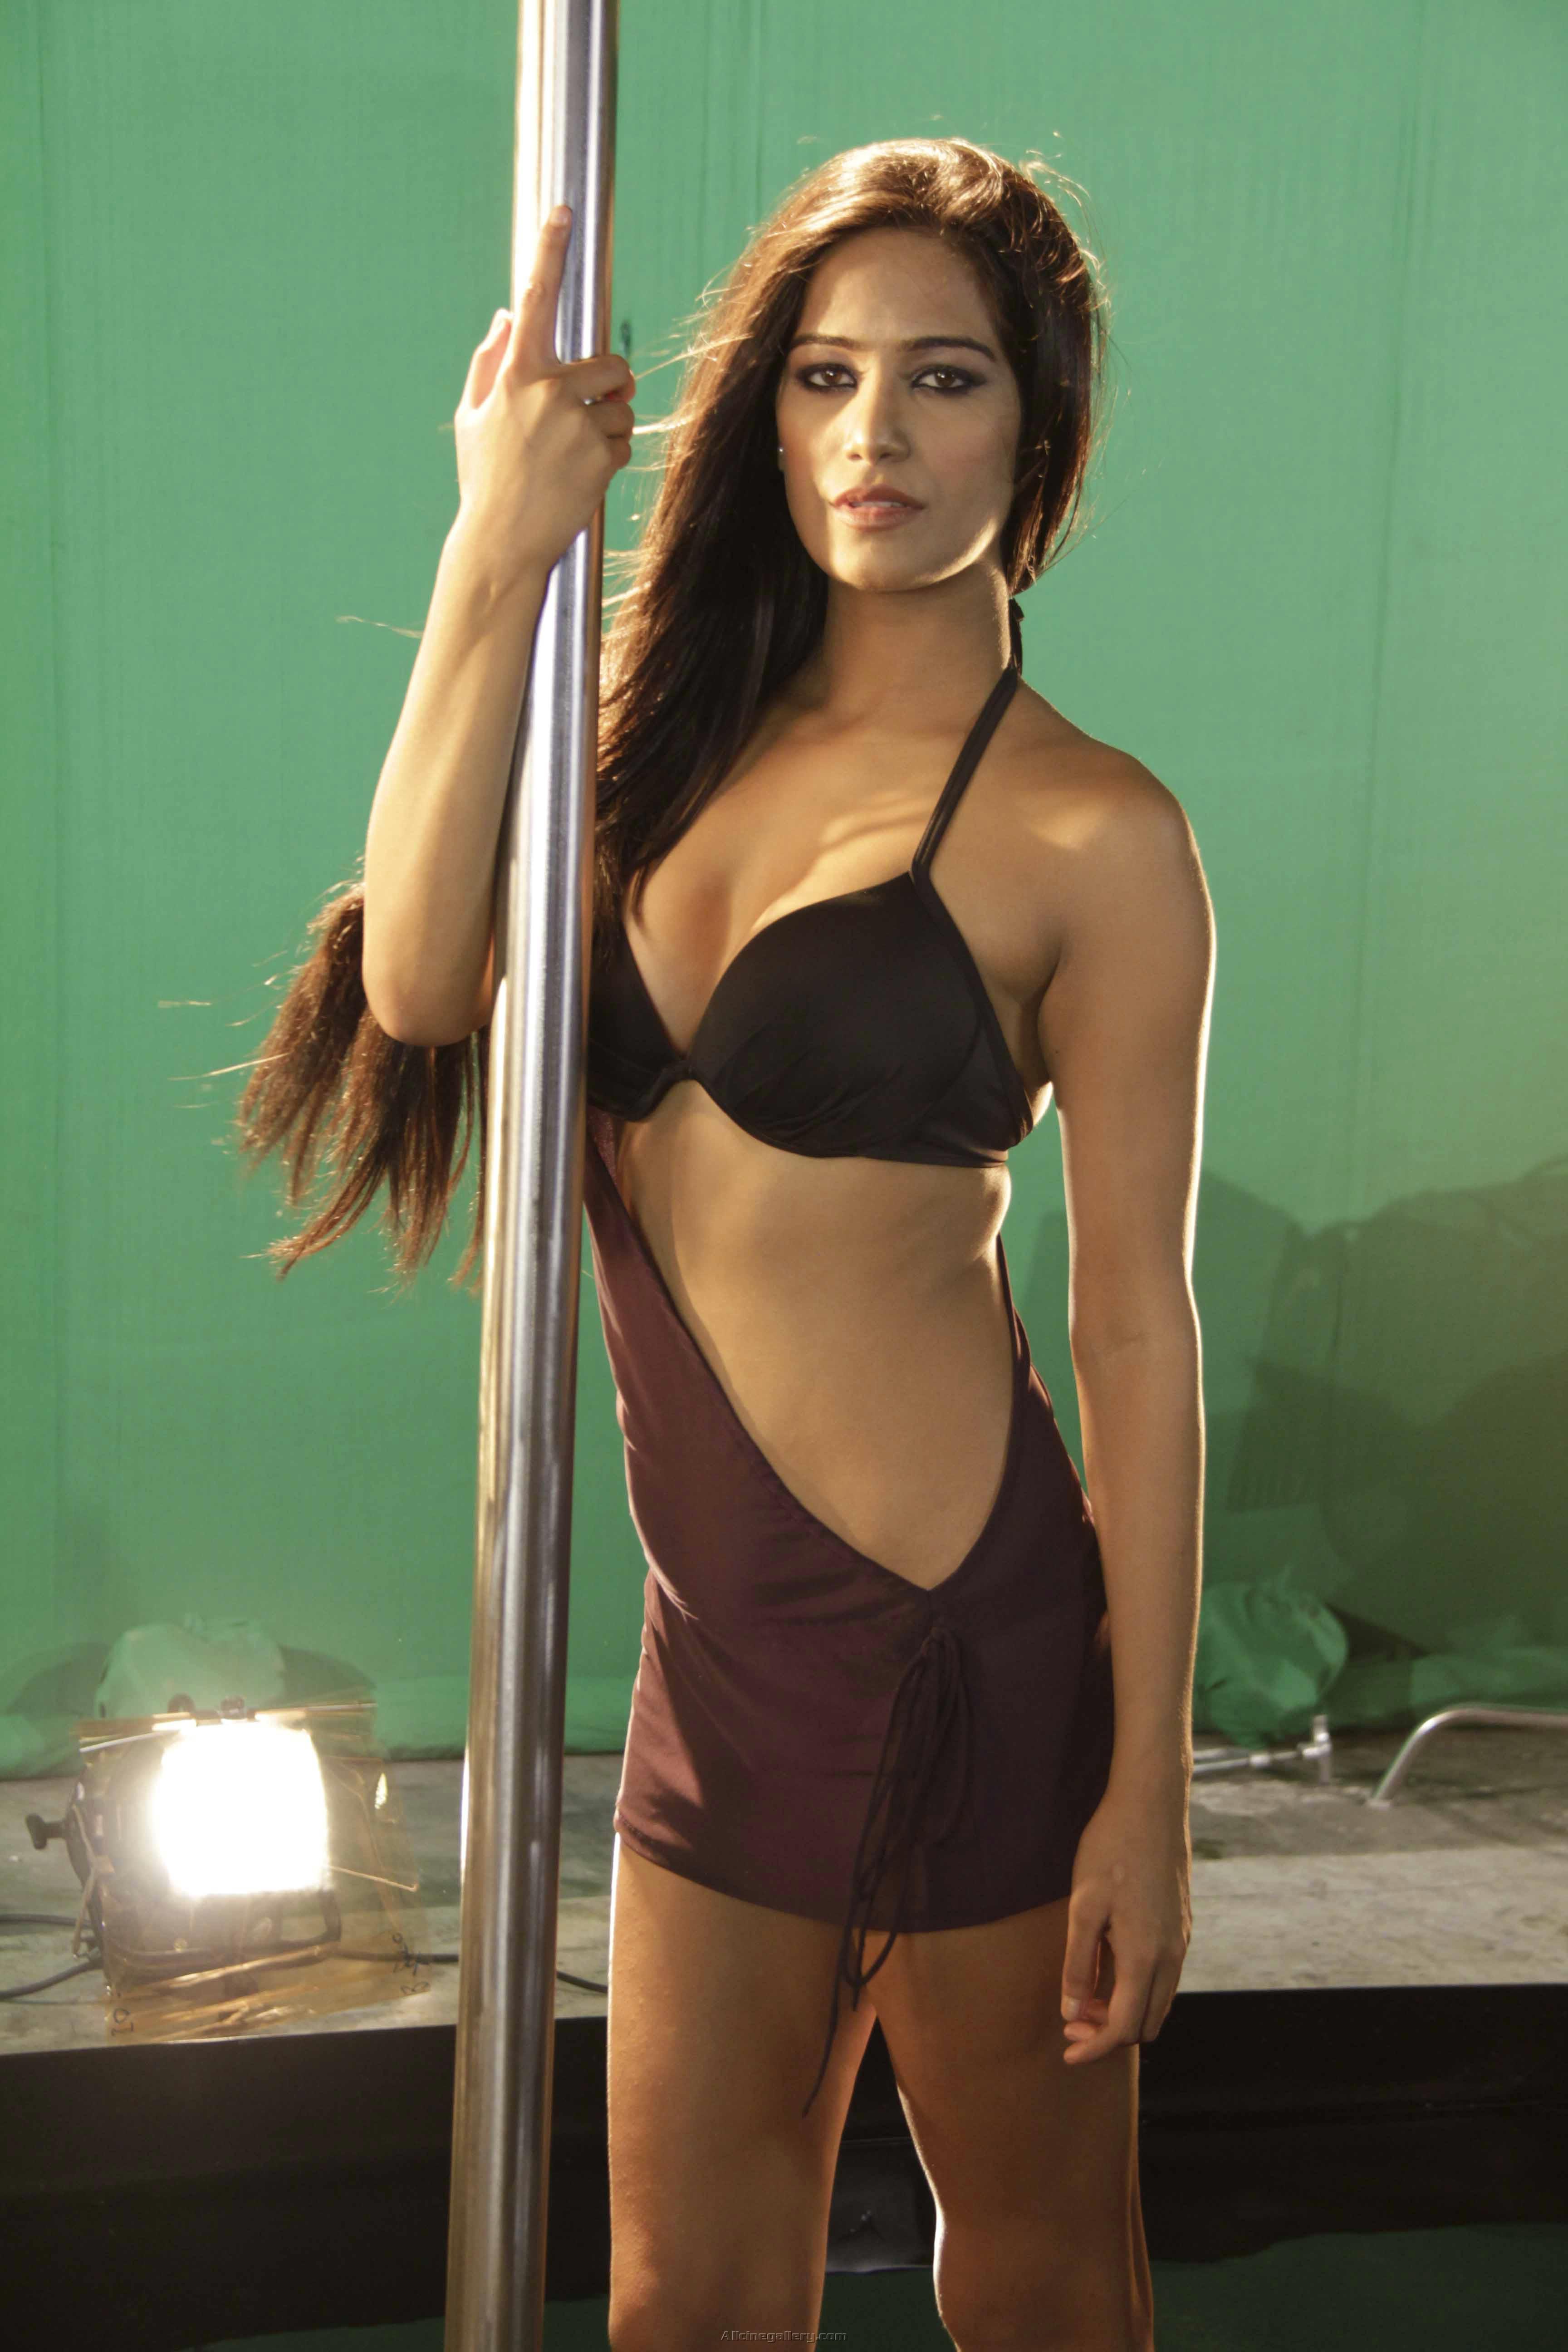 Poonam Pandey hot photos in bikini